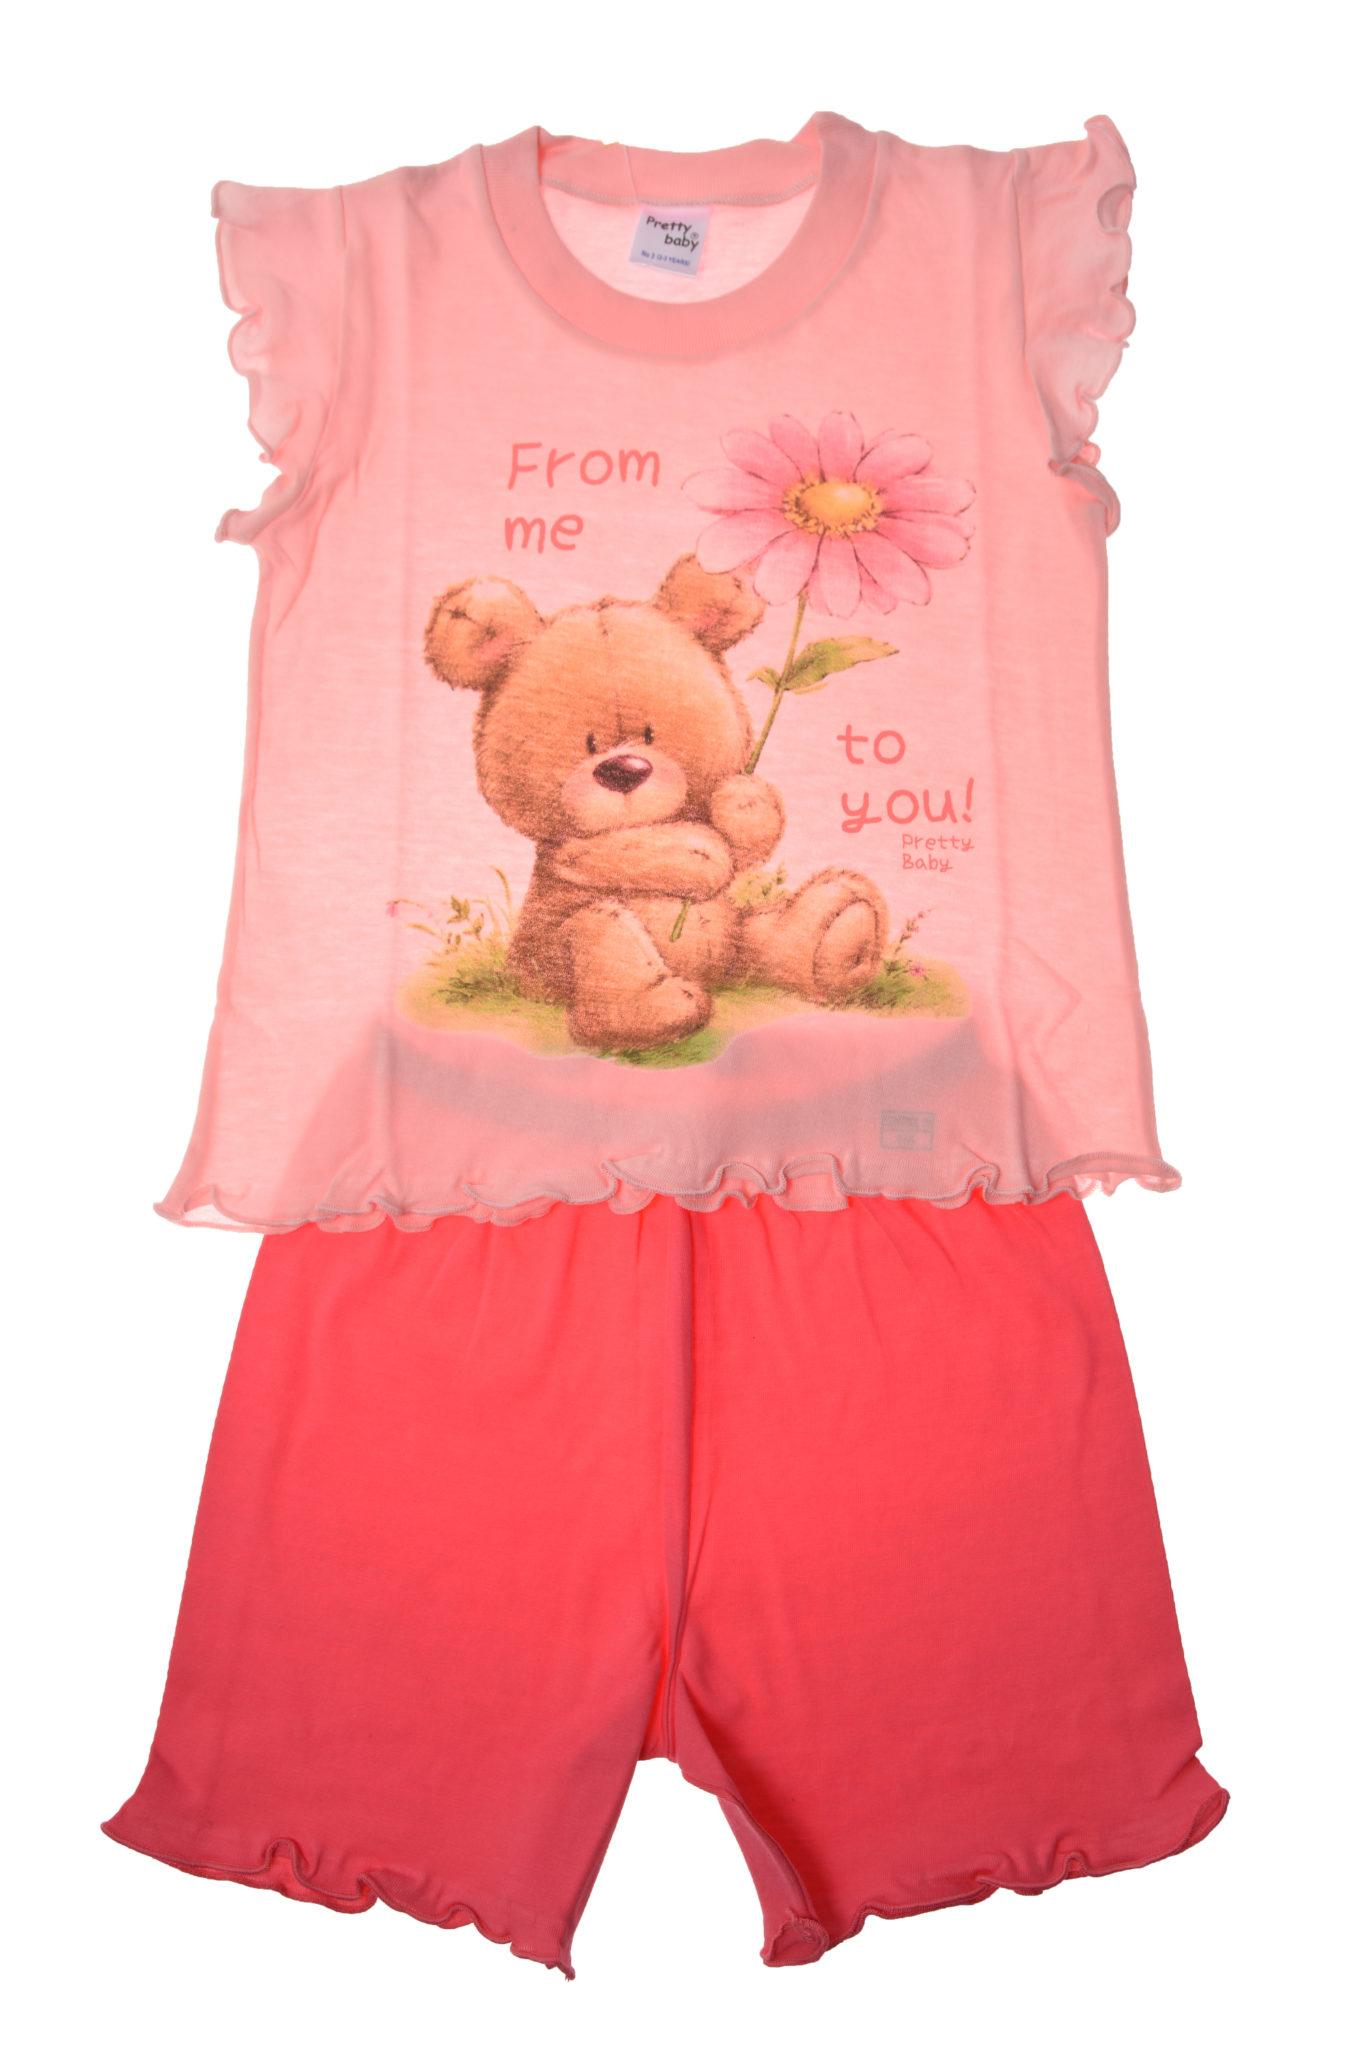 648175e9c98 Ροζ πυτζάμα για κοριτσάκι με σχέδιο αρκουδάκι - 100% βαμβακερή - Baby 03